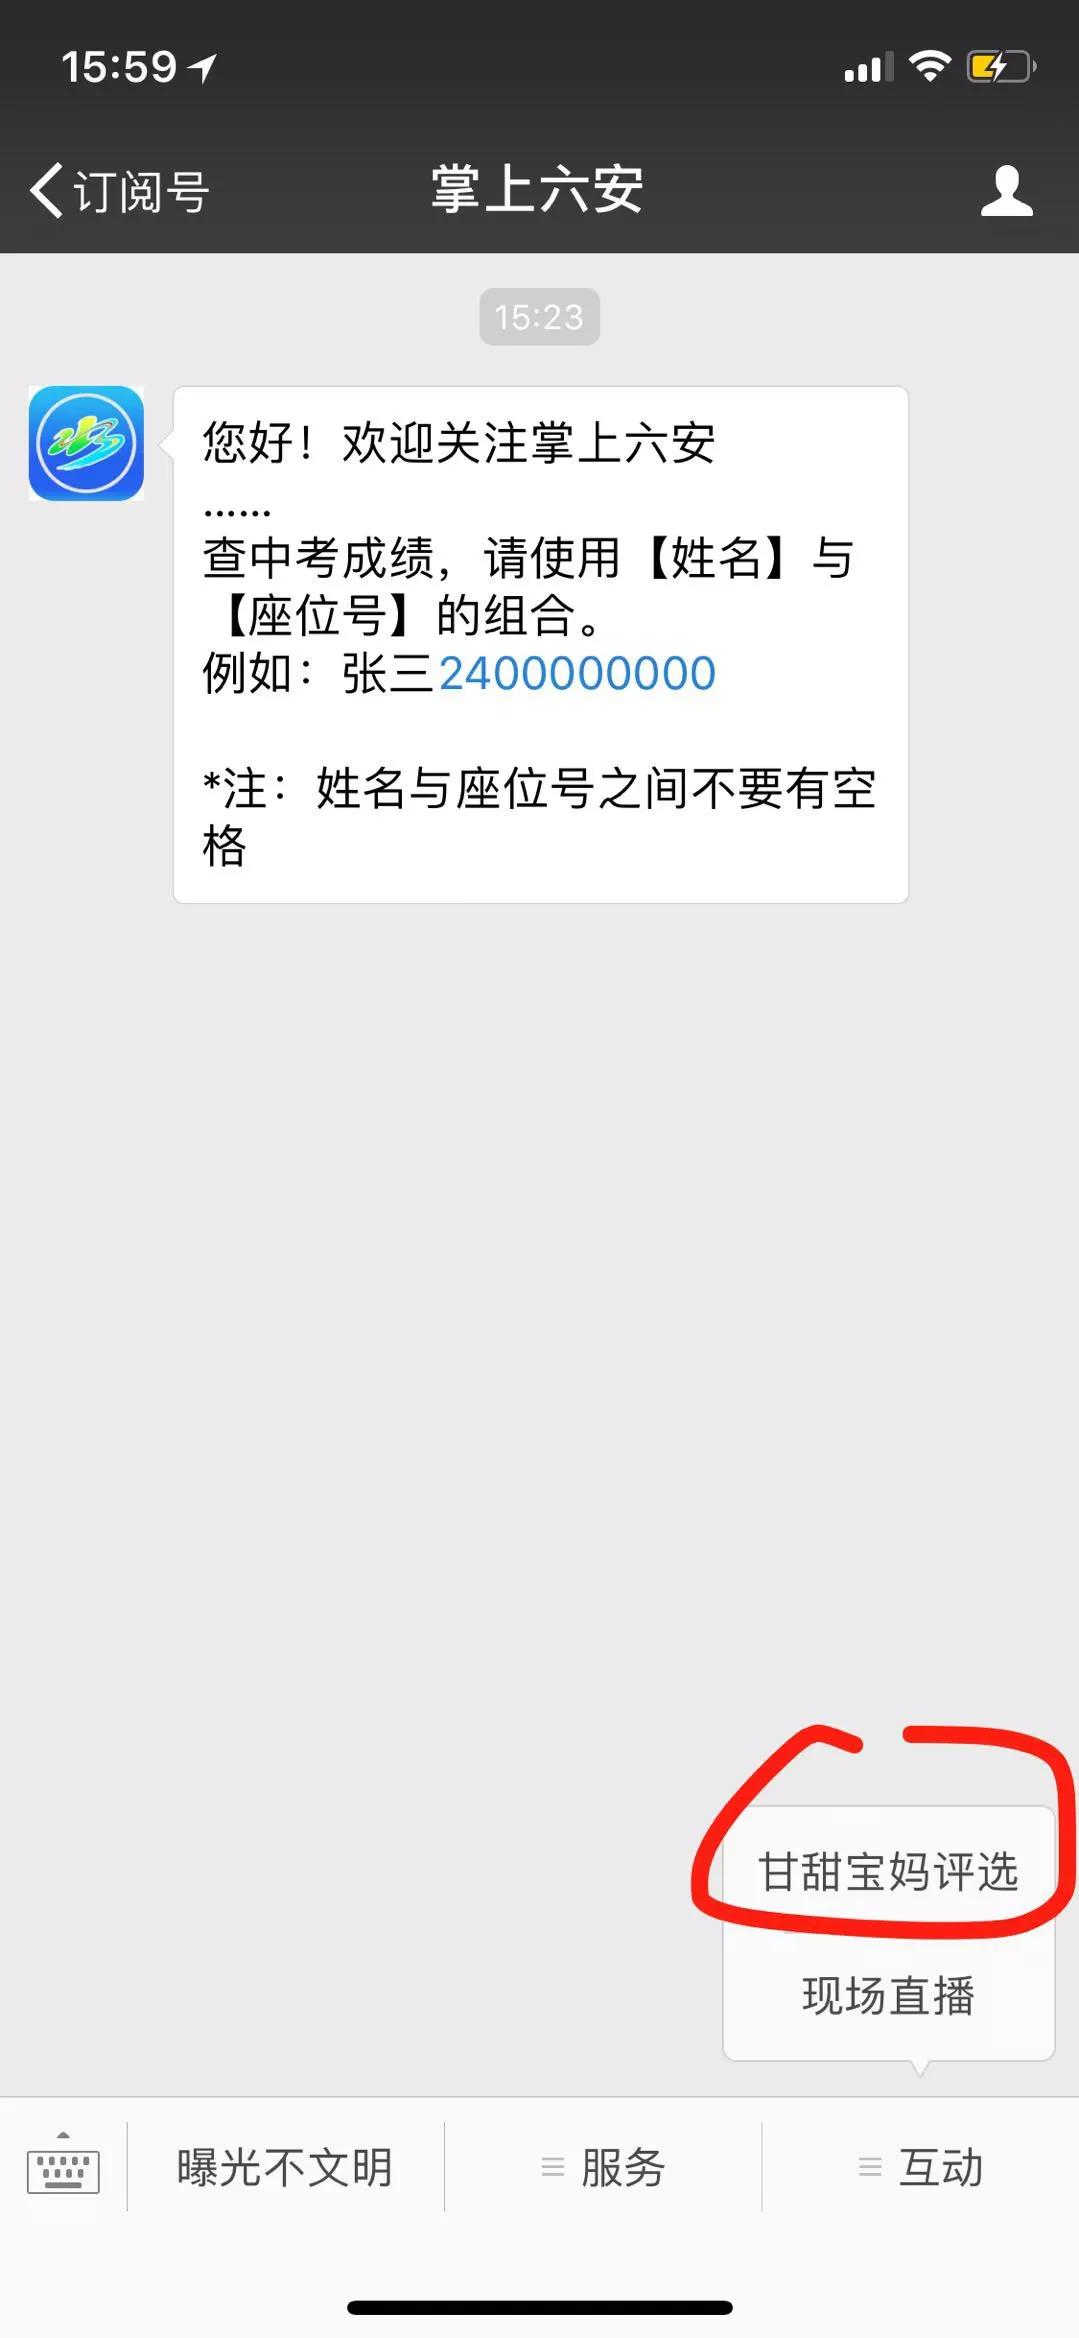 QQ图片20180709141209.png